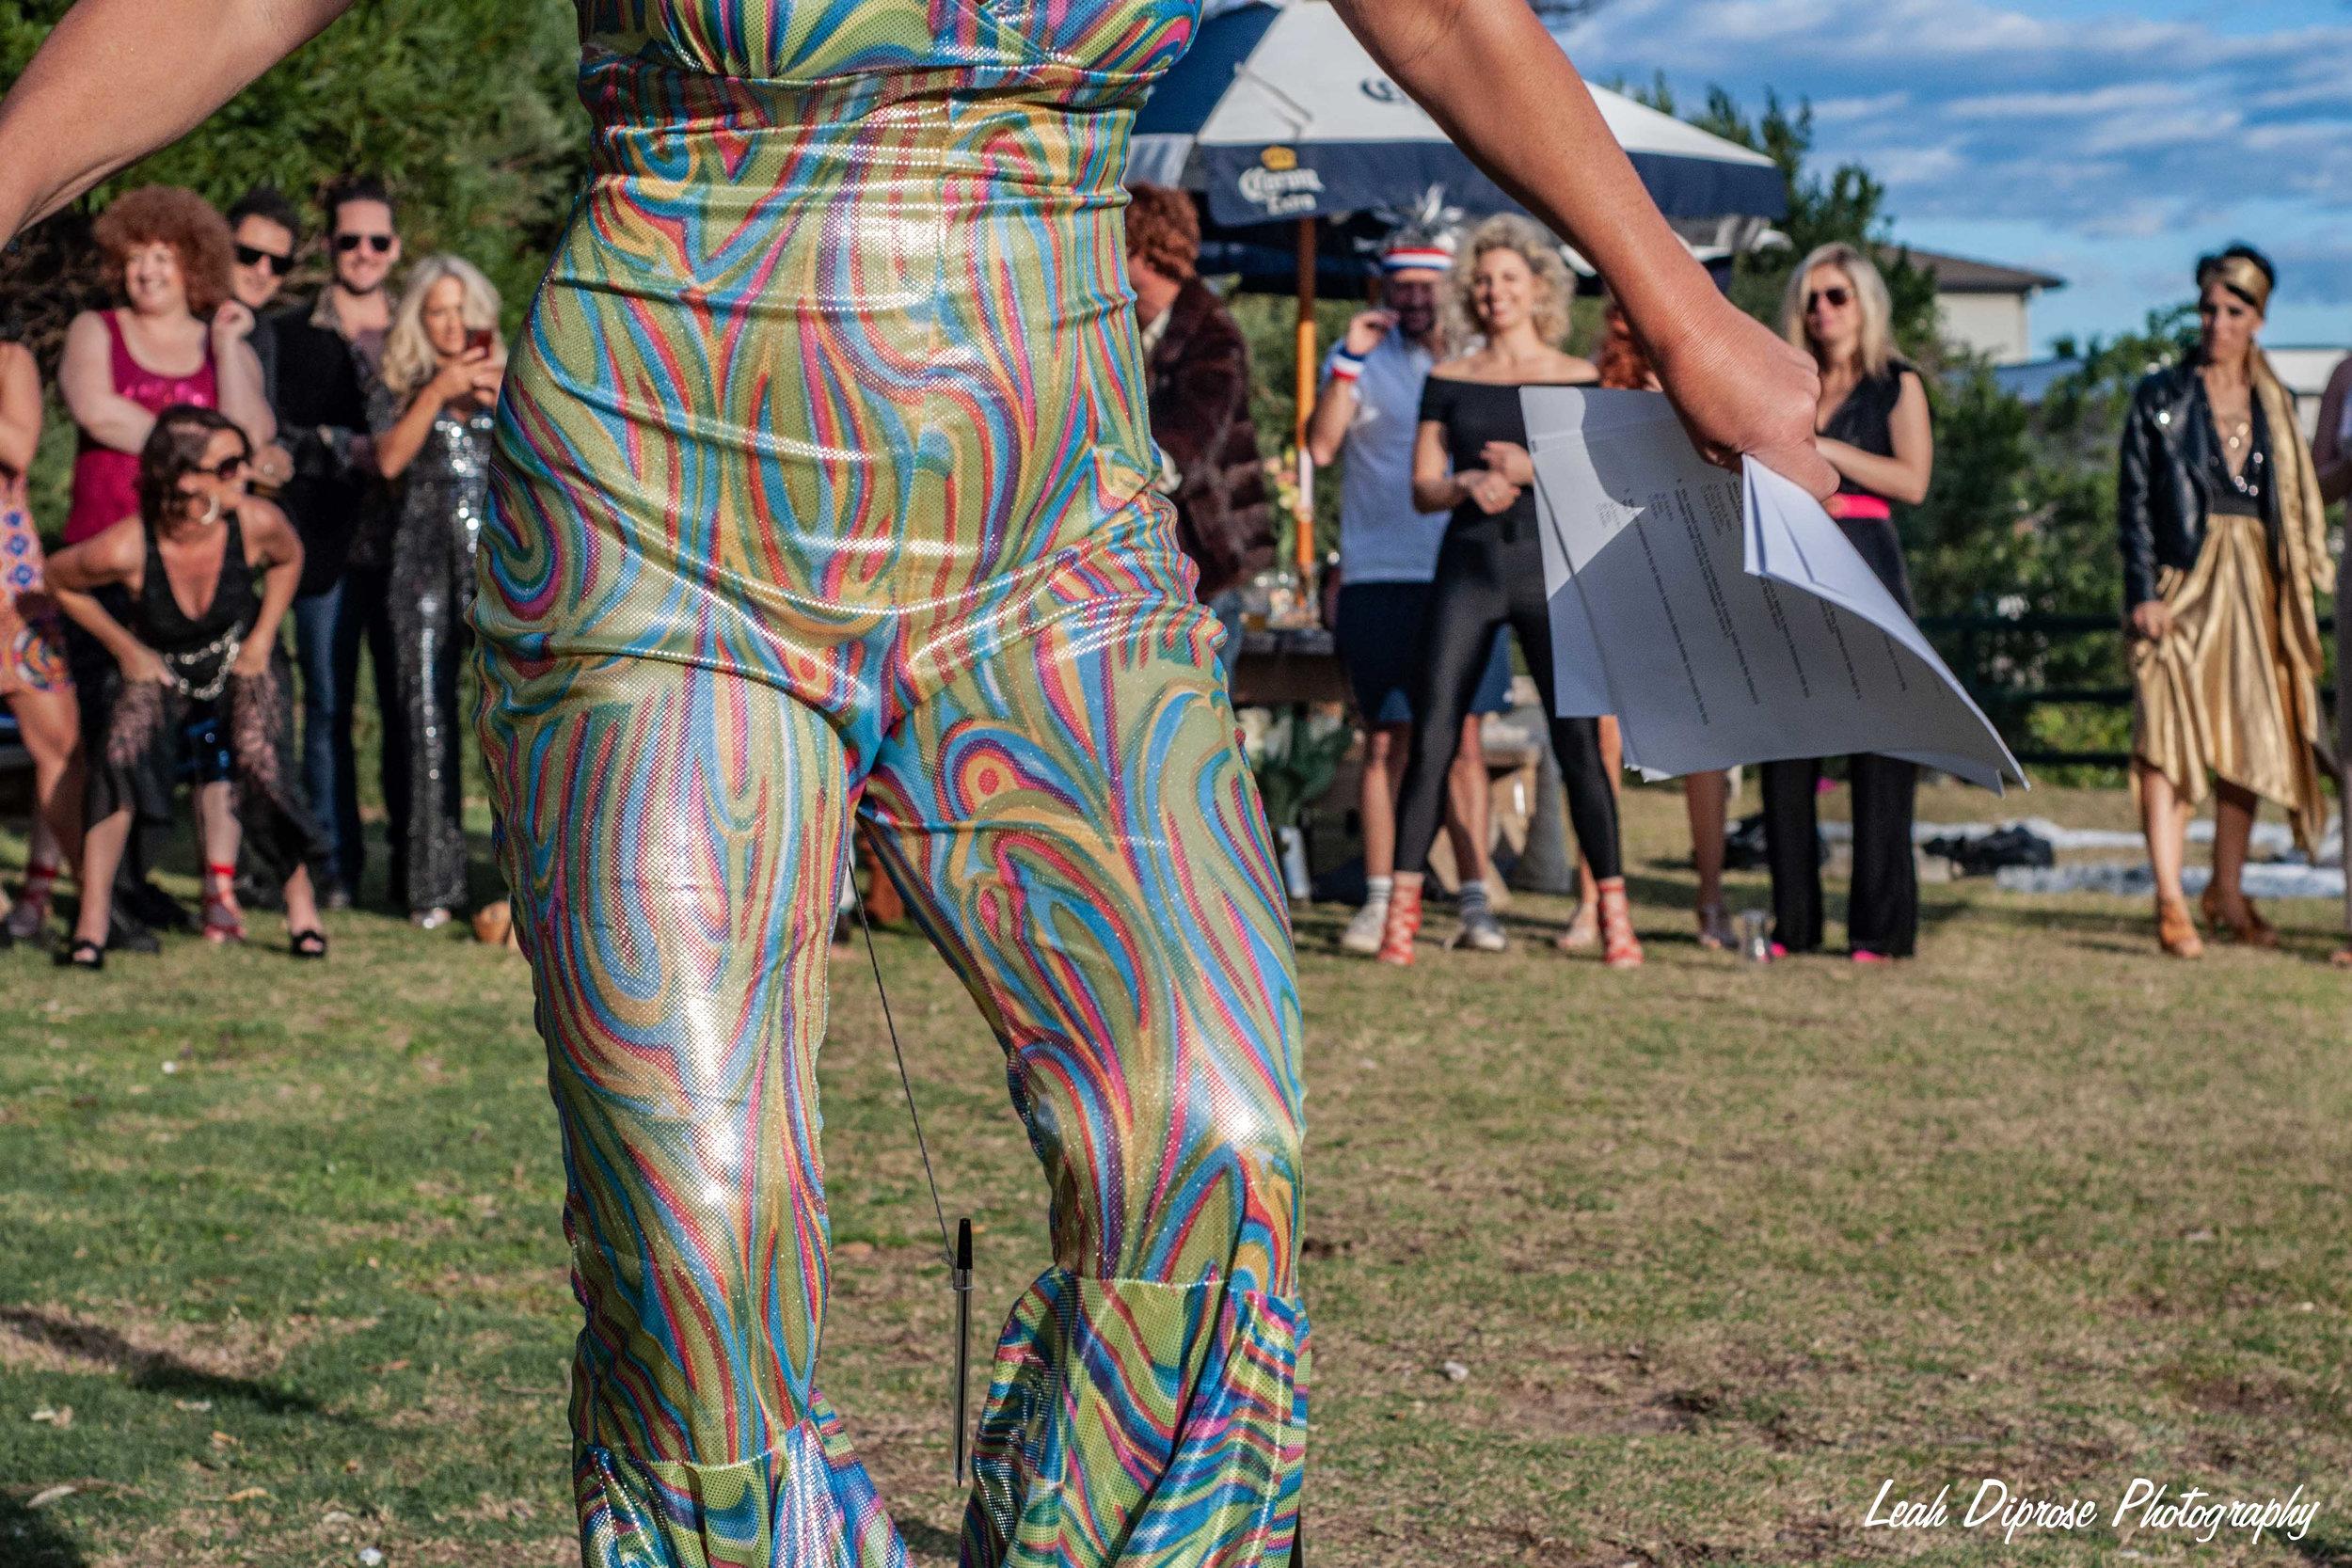 Leah Diprose Photography image-9840.jpg